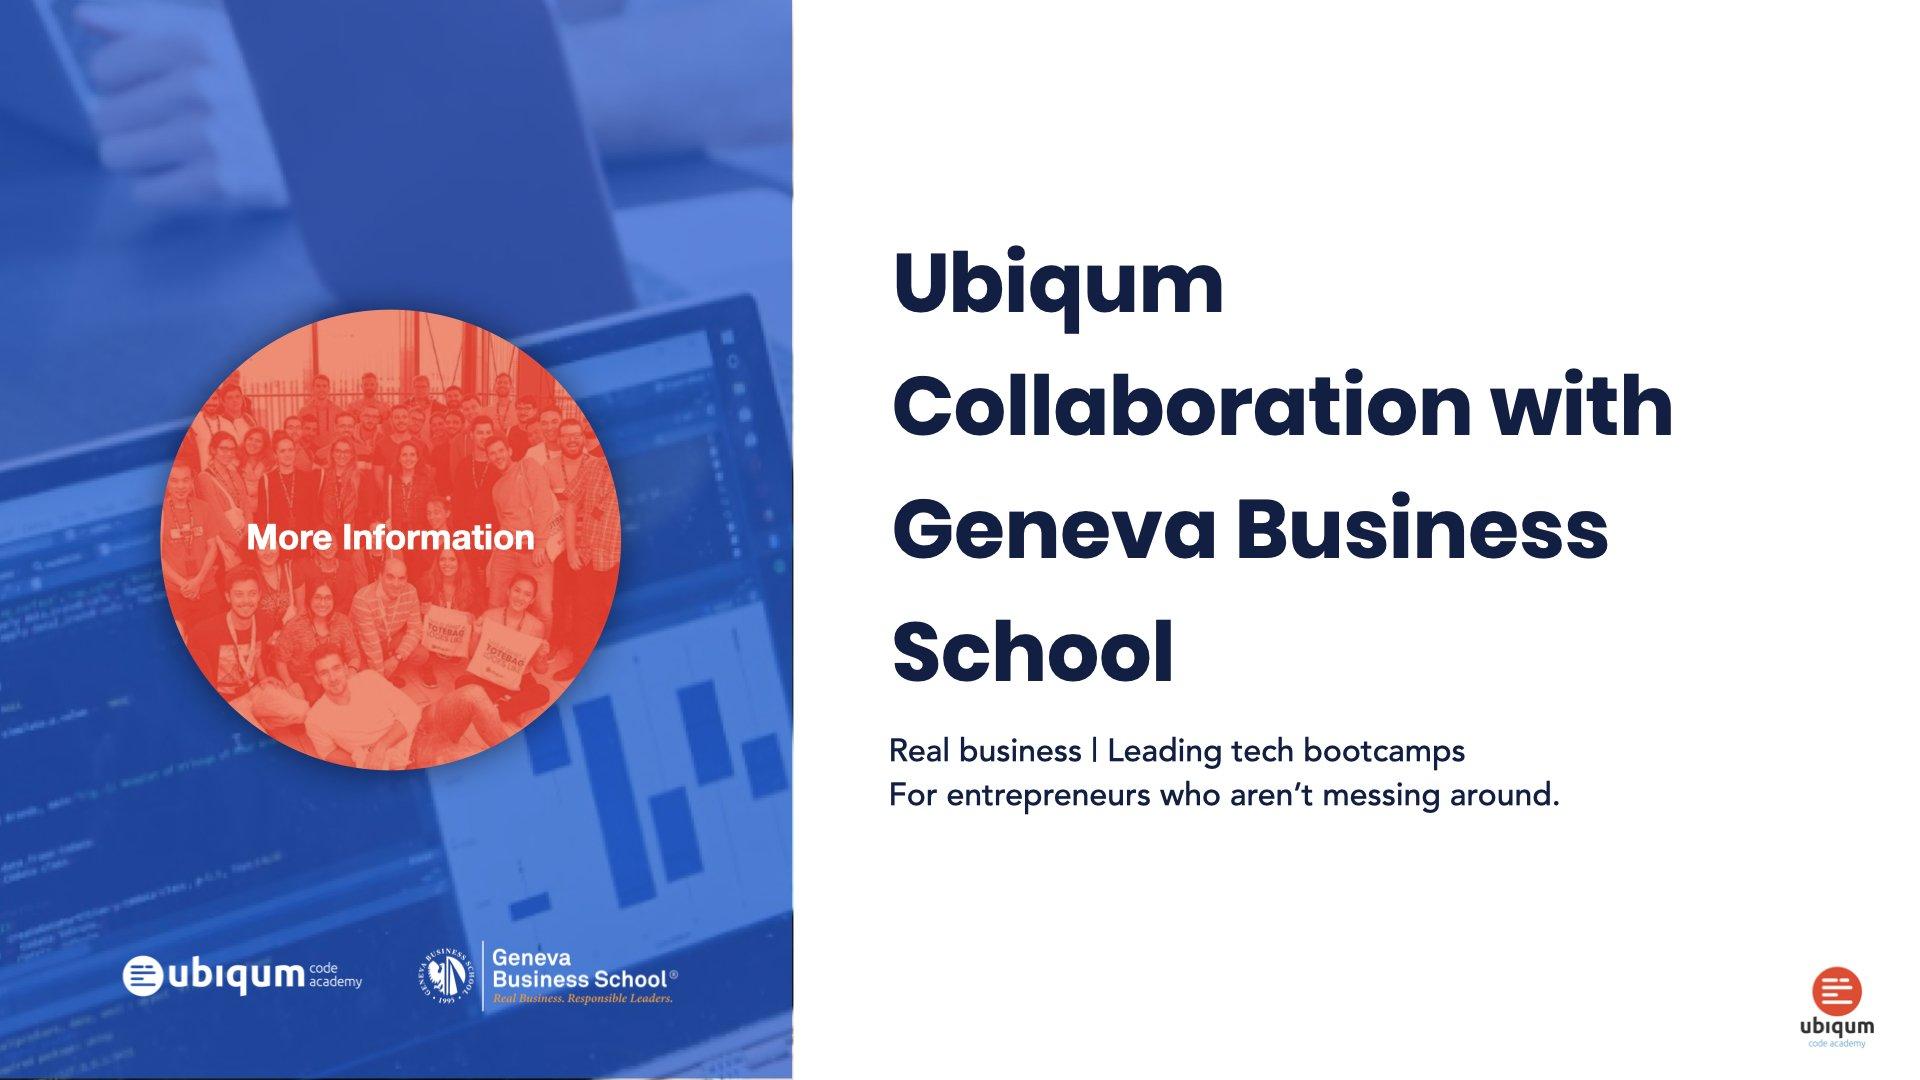 Ubiqum Collaboration with Geneva Business School featured